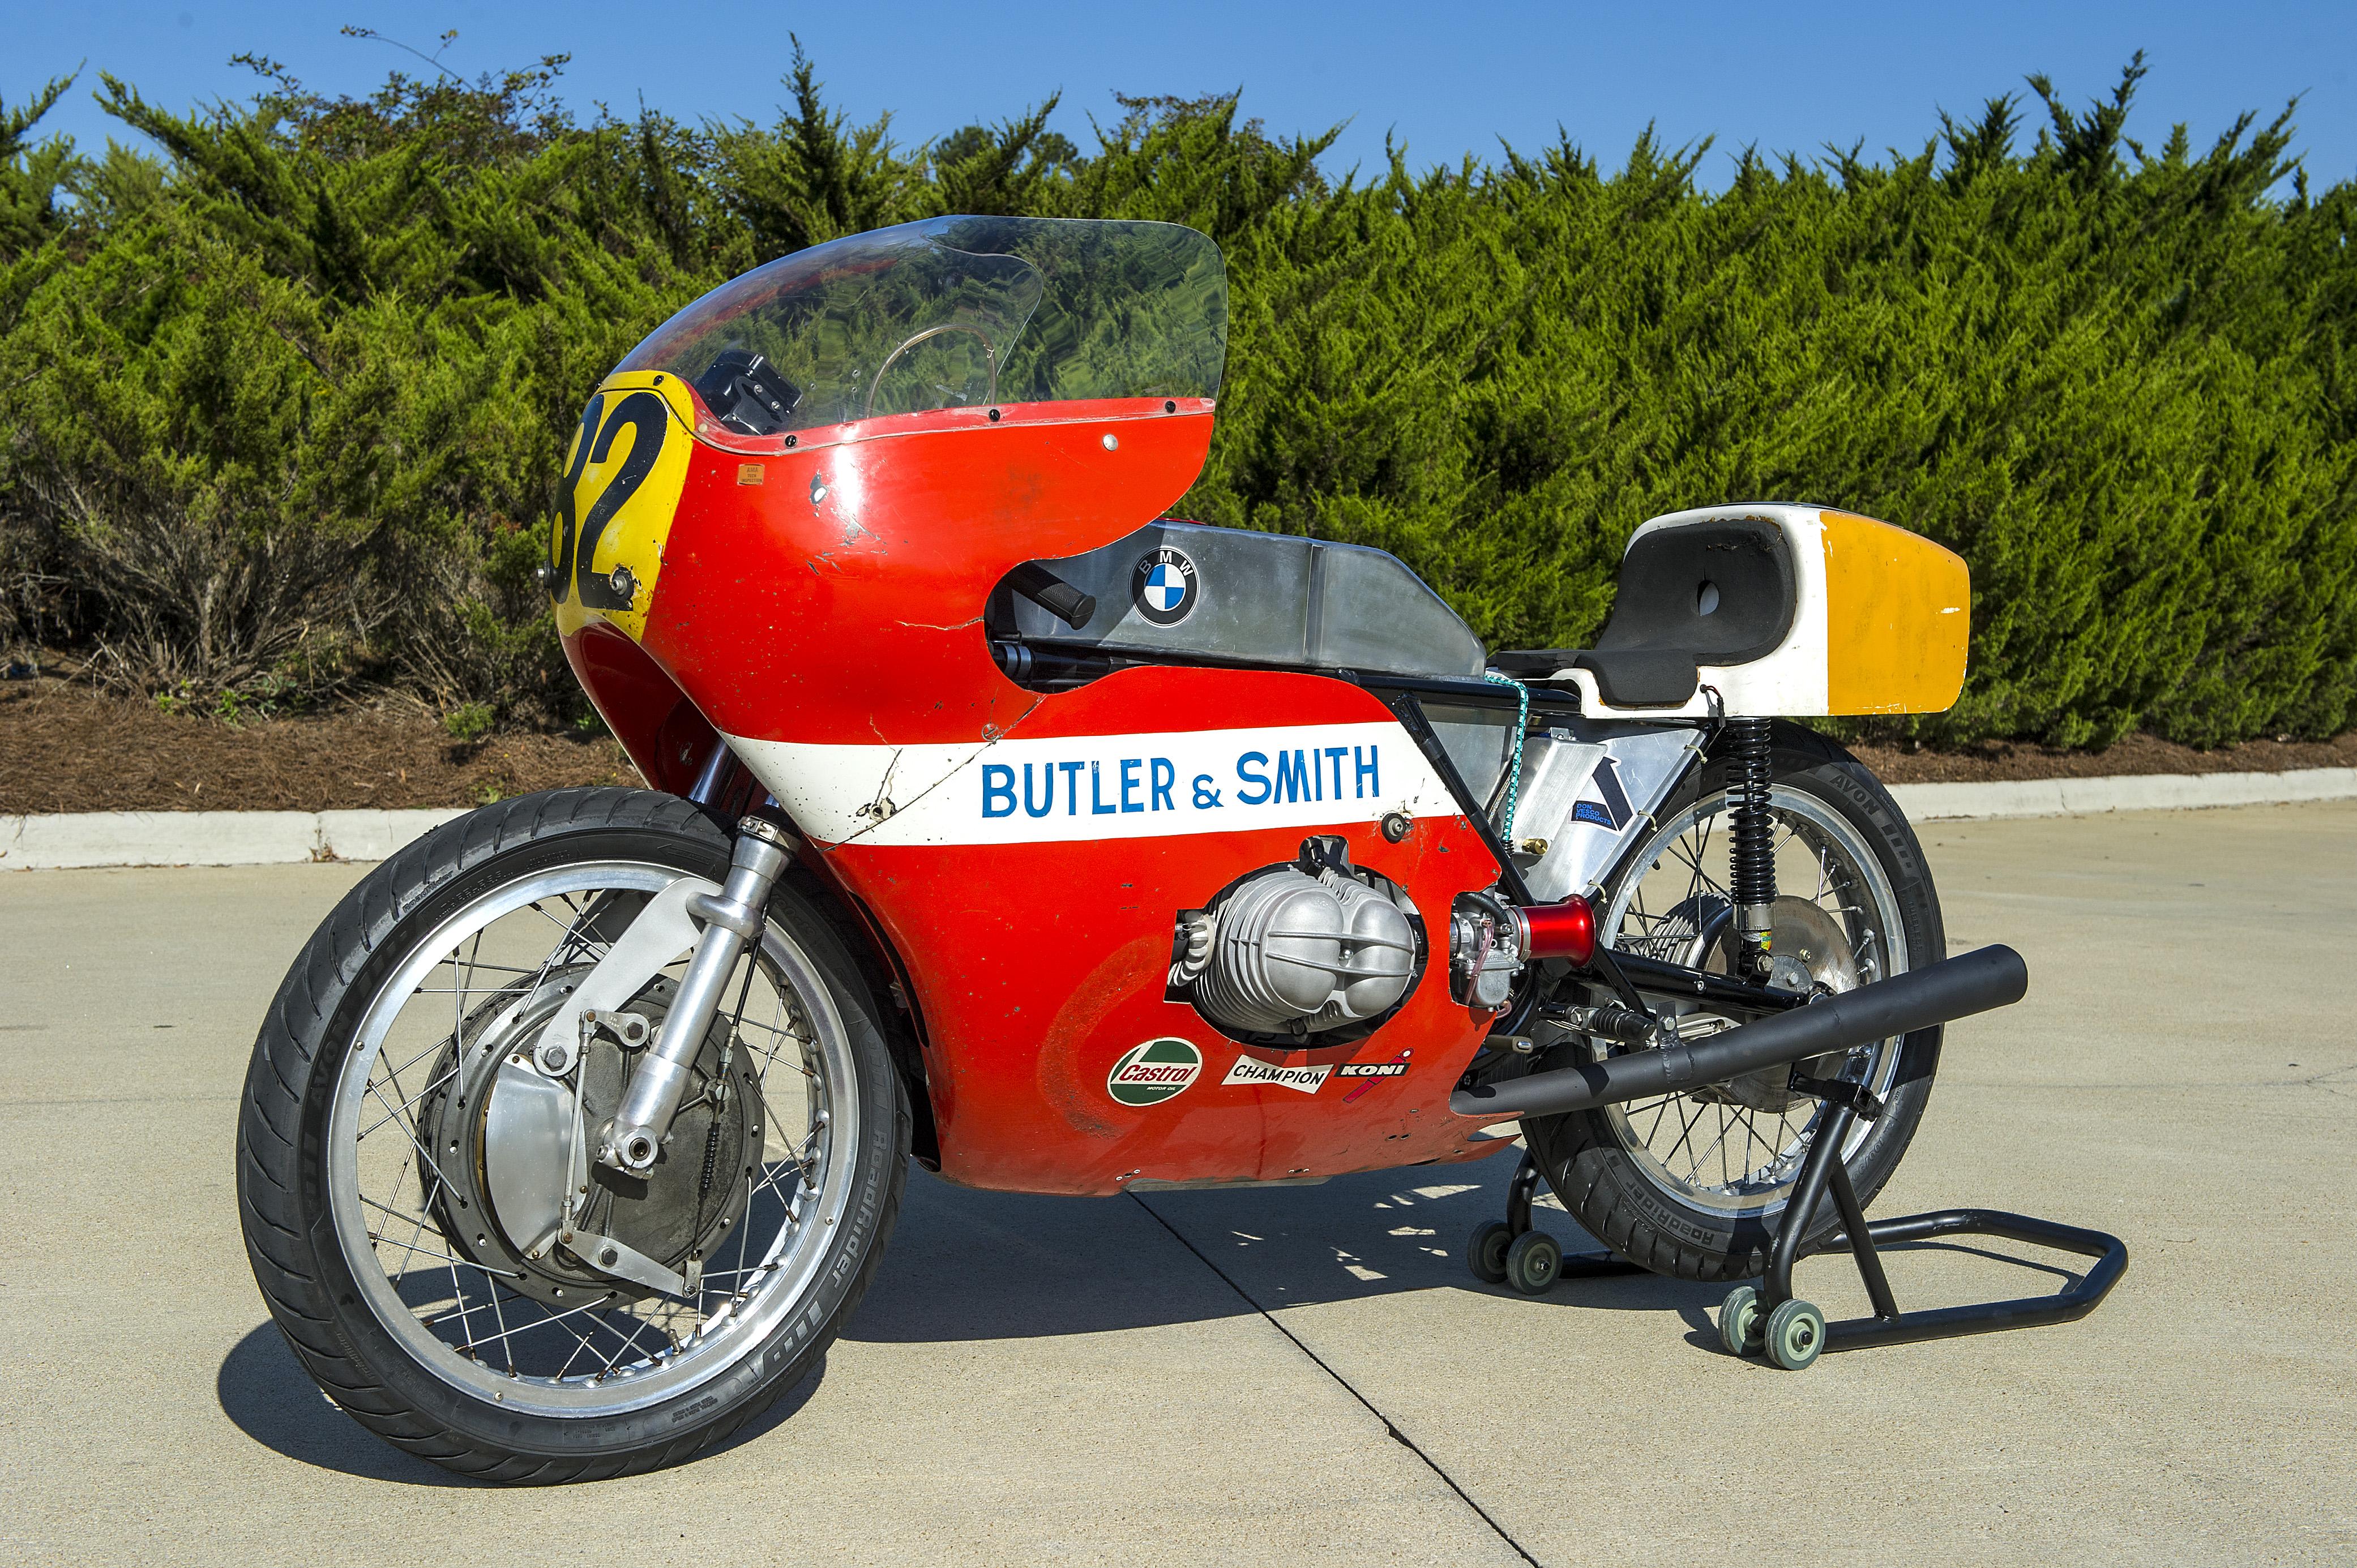 IOM TT-winning bike and BMW F750 go under the hammer